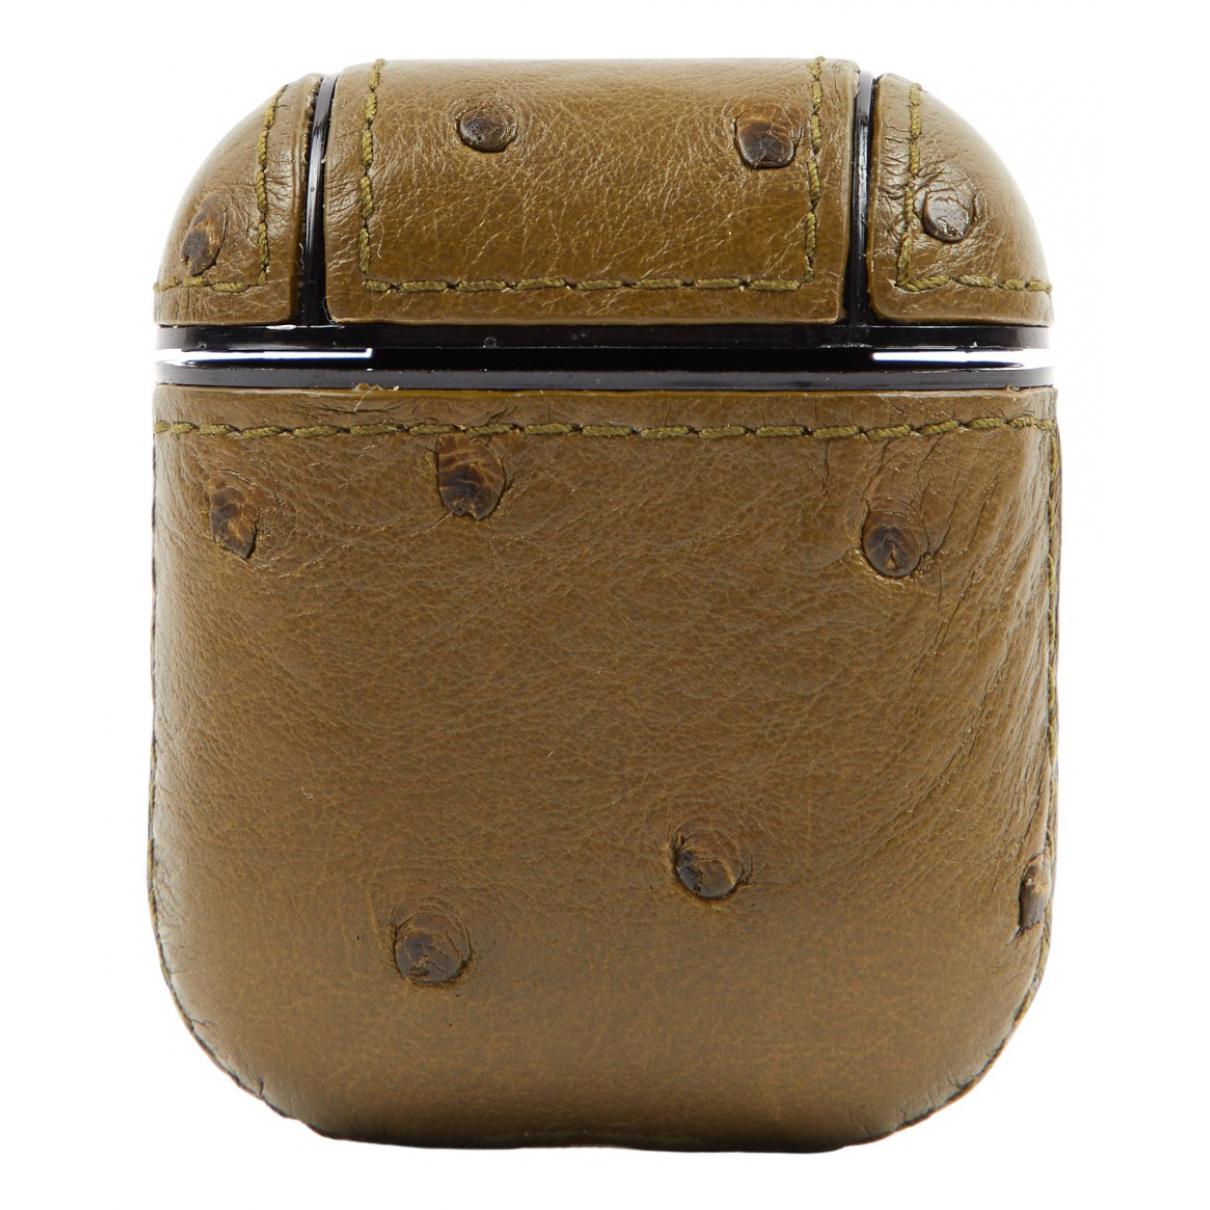 Bottega Veneta - Accessoires   pour lifestyle en autruche - kaki